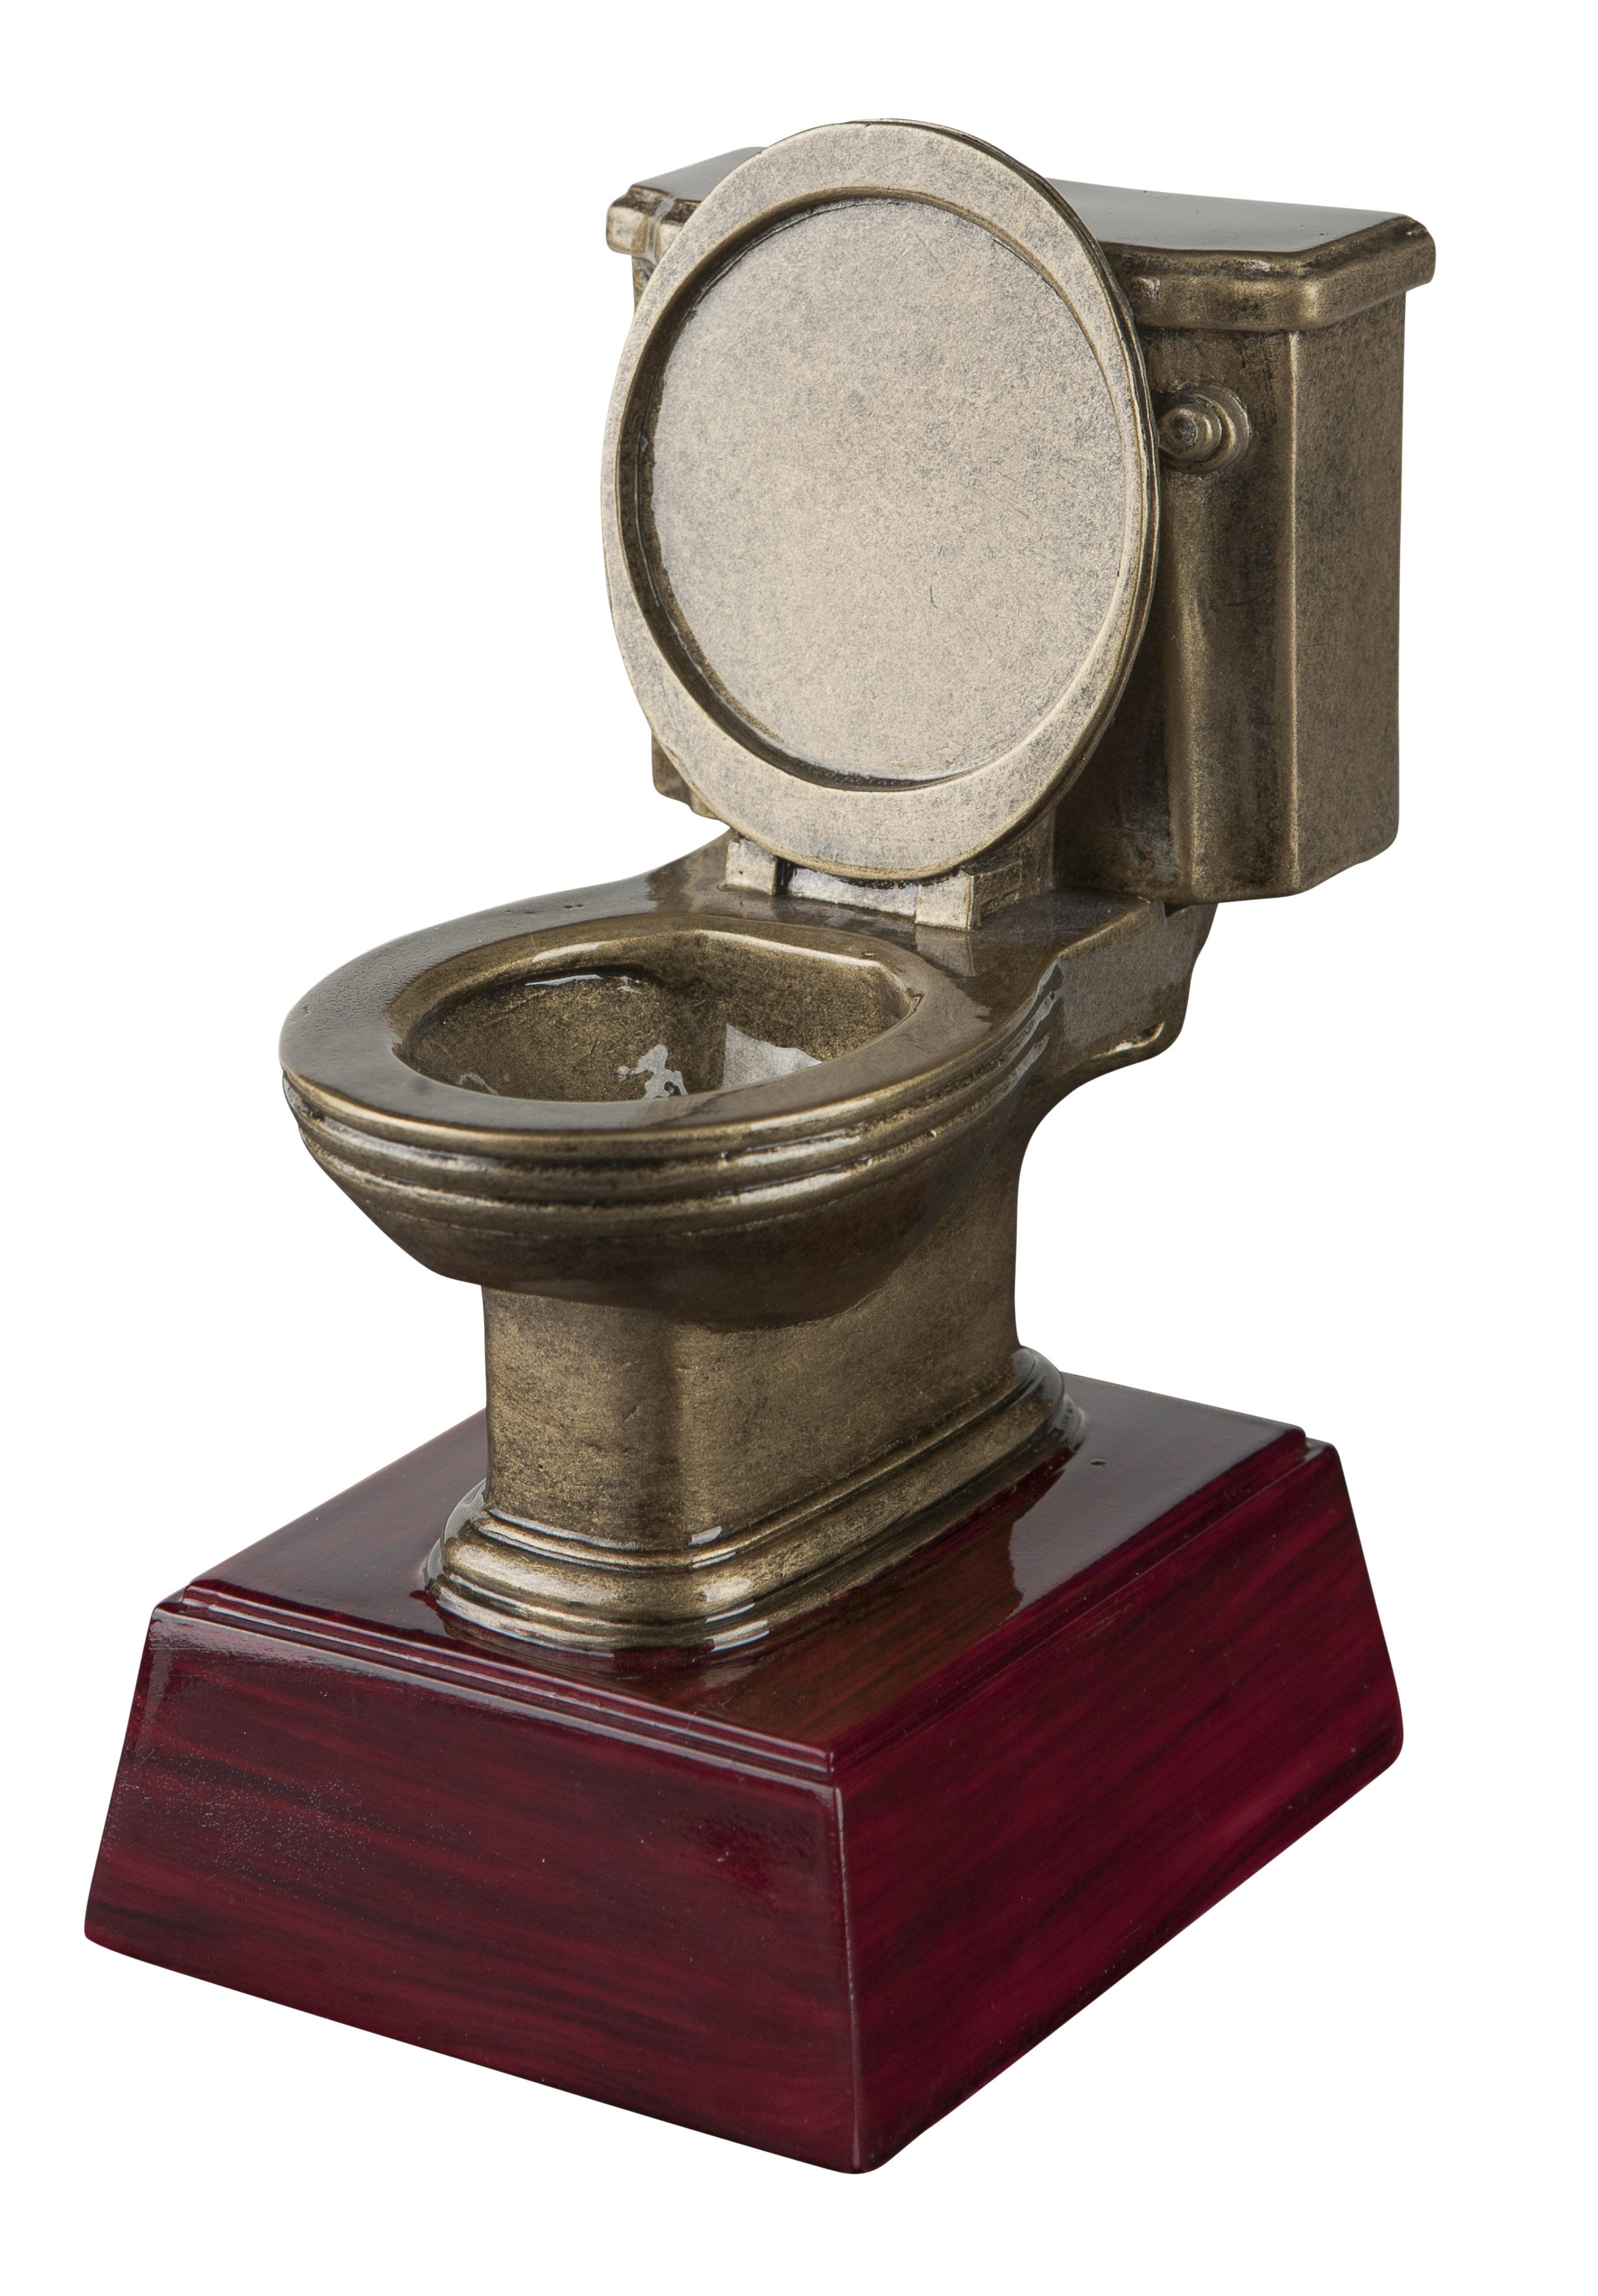 Toilet Bowl Resin Trophy Awardtrophy Trolley